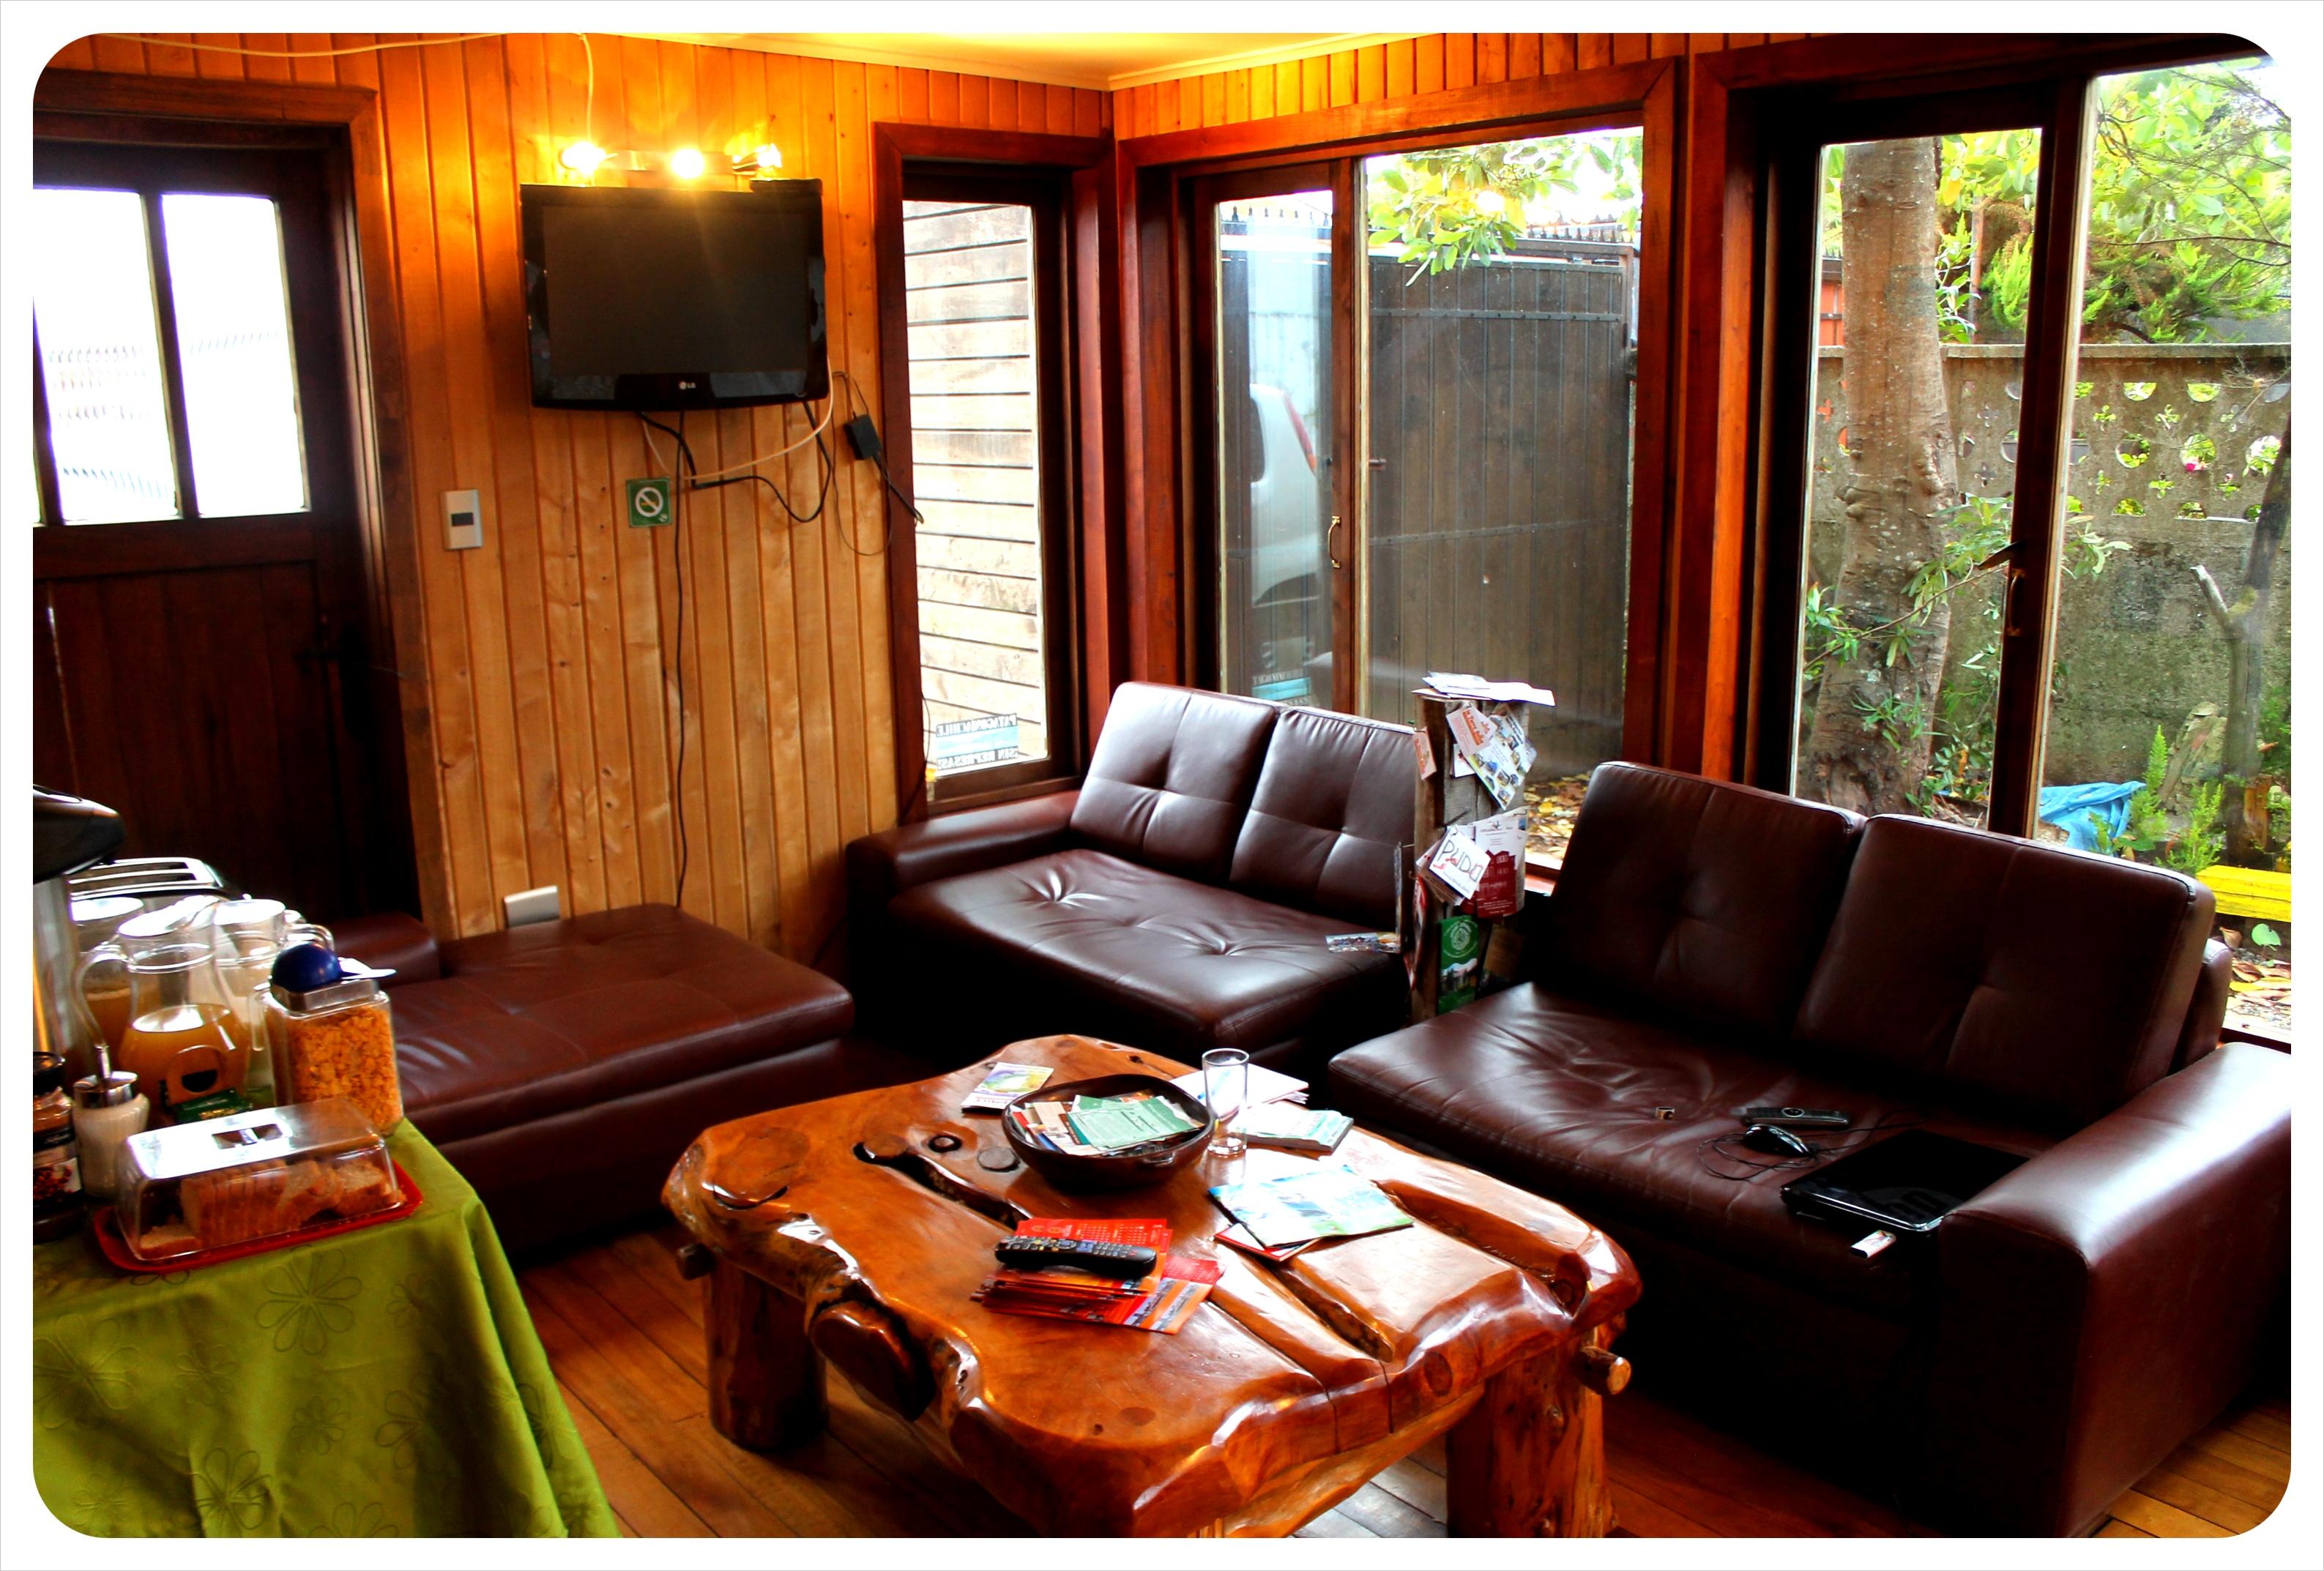 bosque nativo valdivia living room